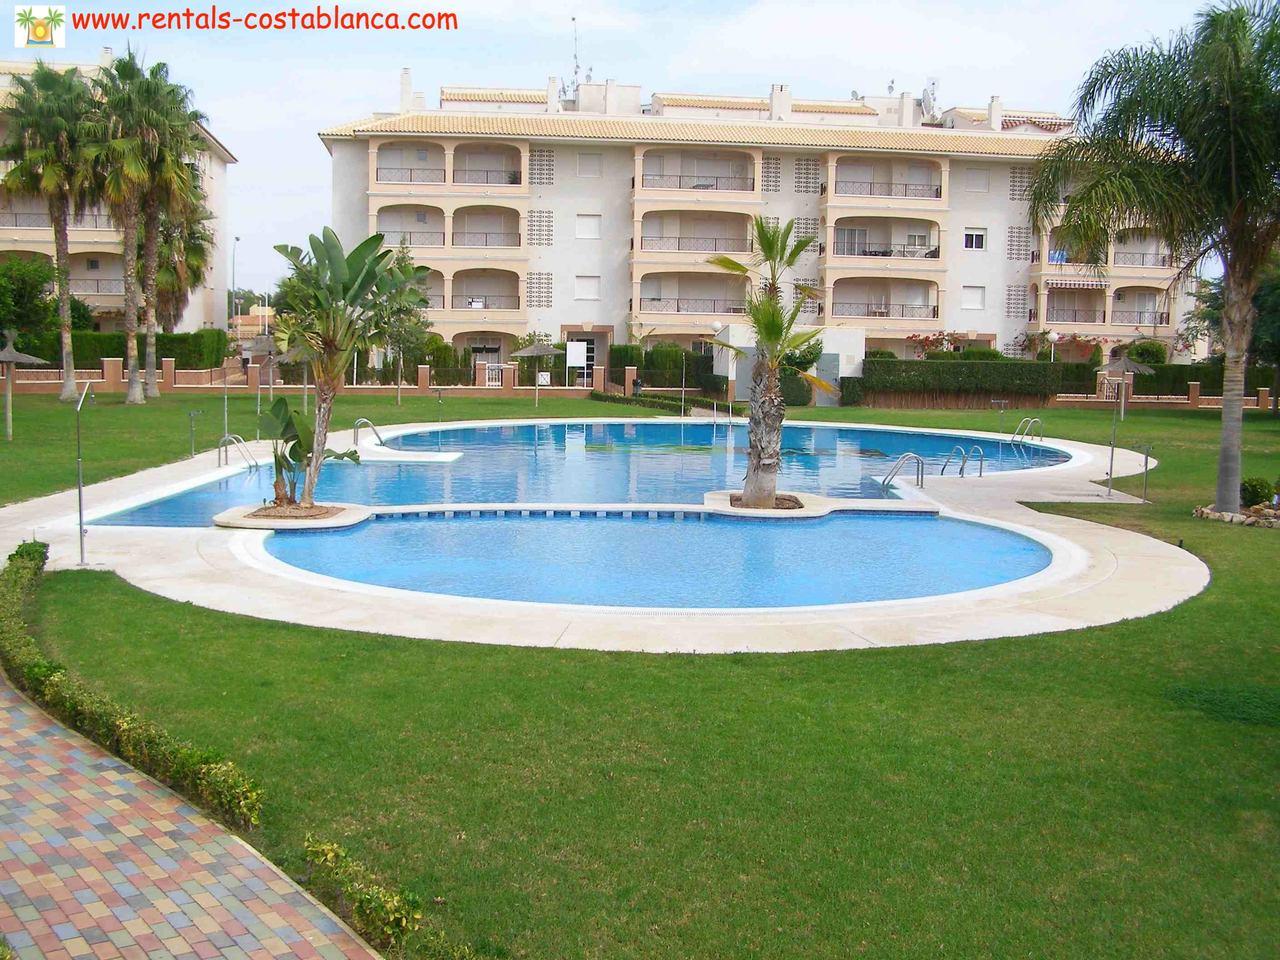 Location & Hébergement de Vacances - Appartements - Spain - Torrevieja / Alicante / Costa Blanca - Torrevieja